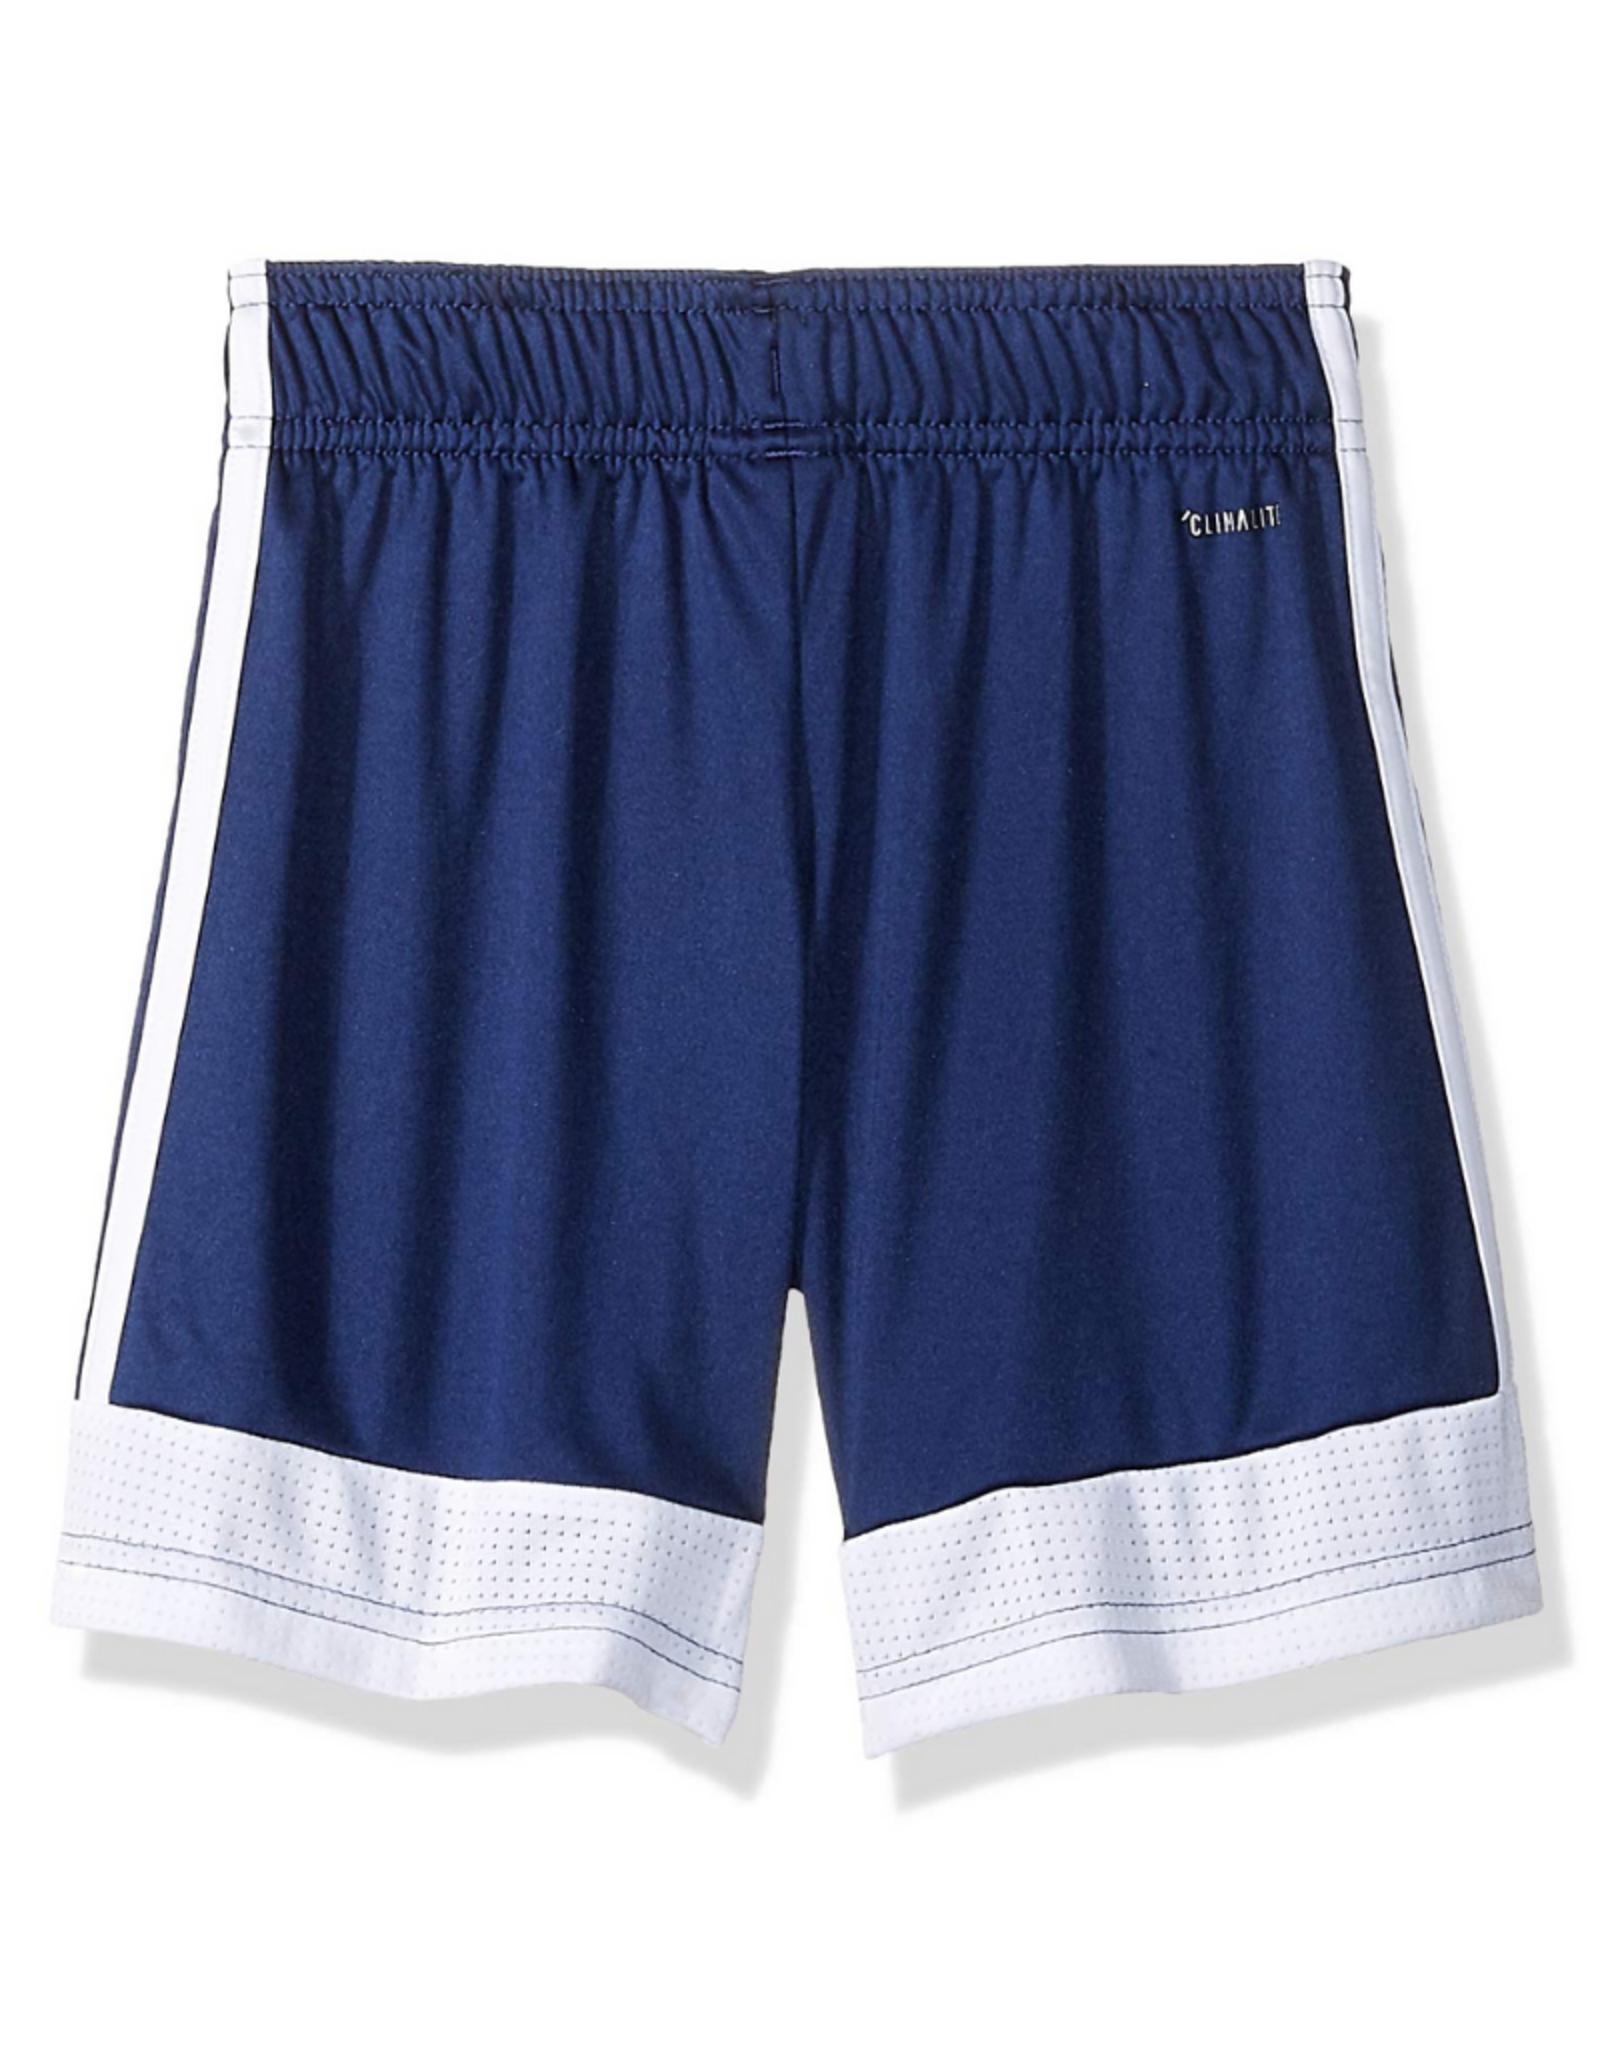 Adidas Adidas Youth Tastigo Soccer Short Navy